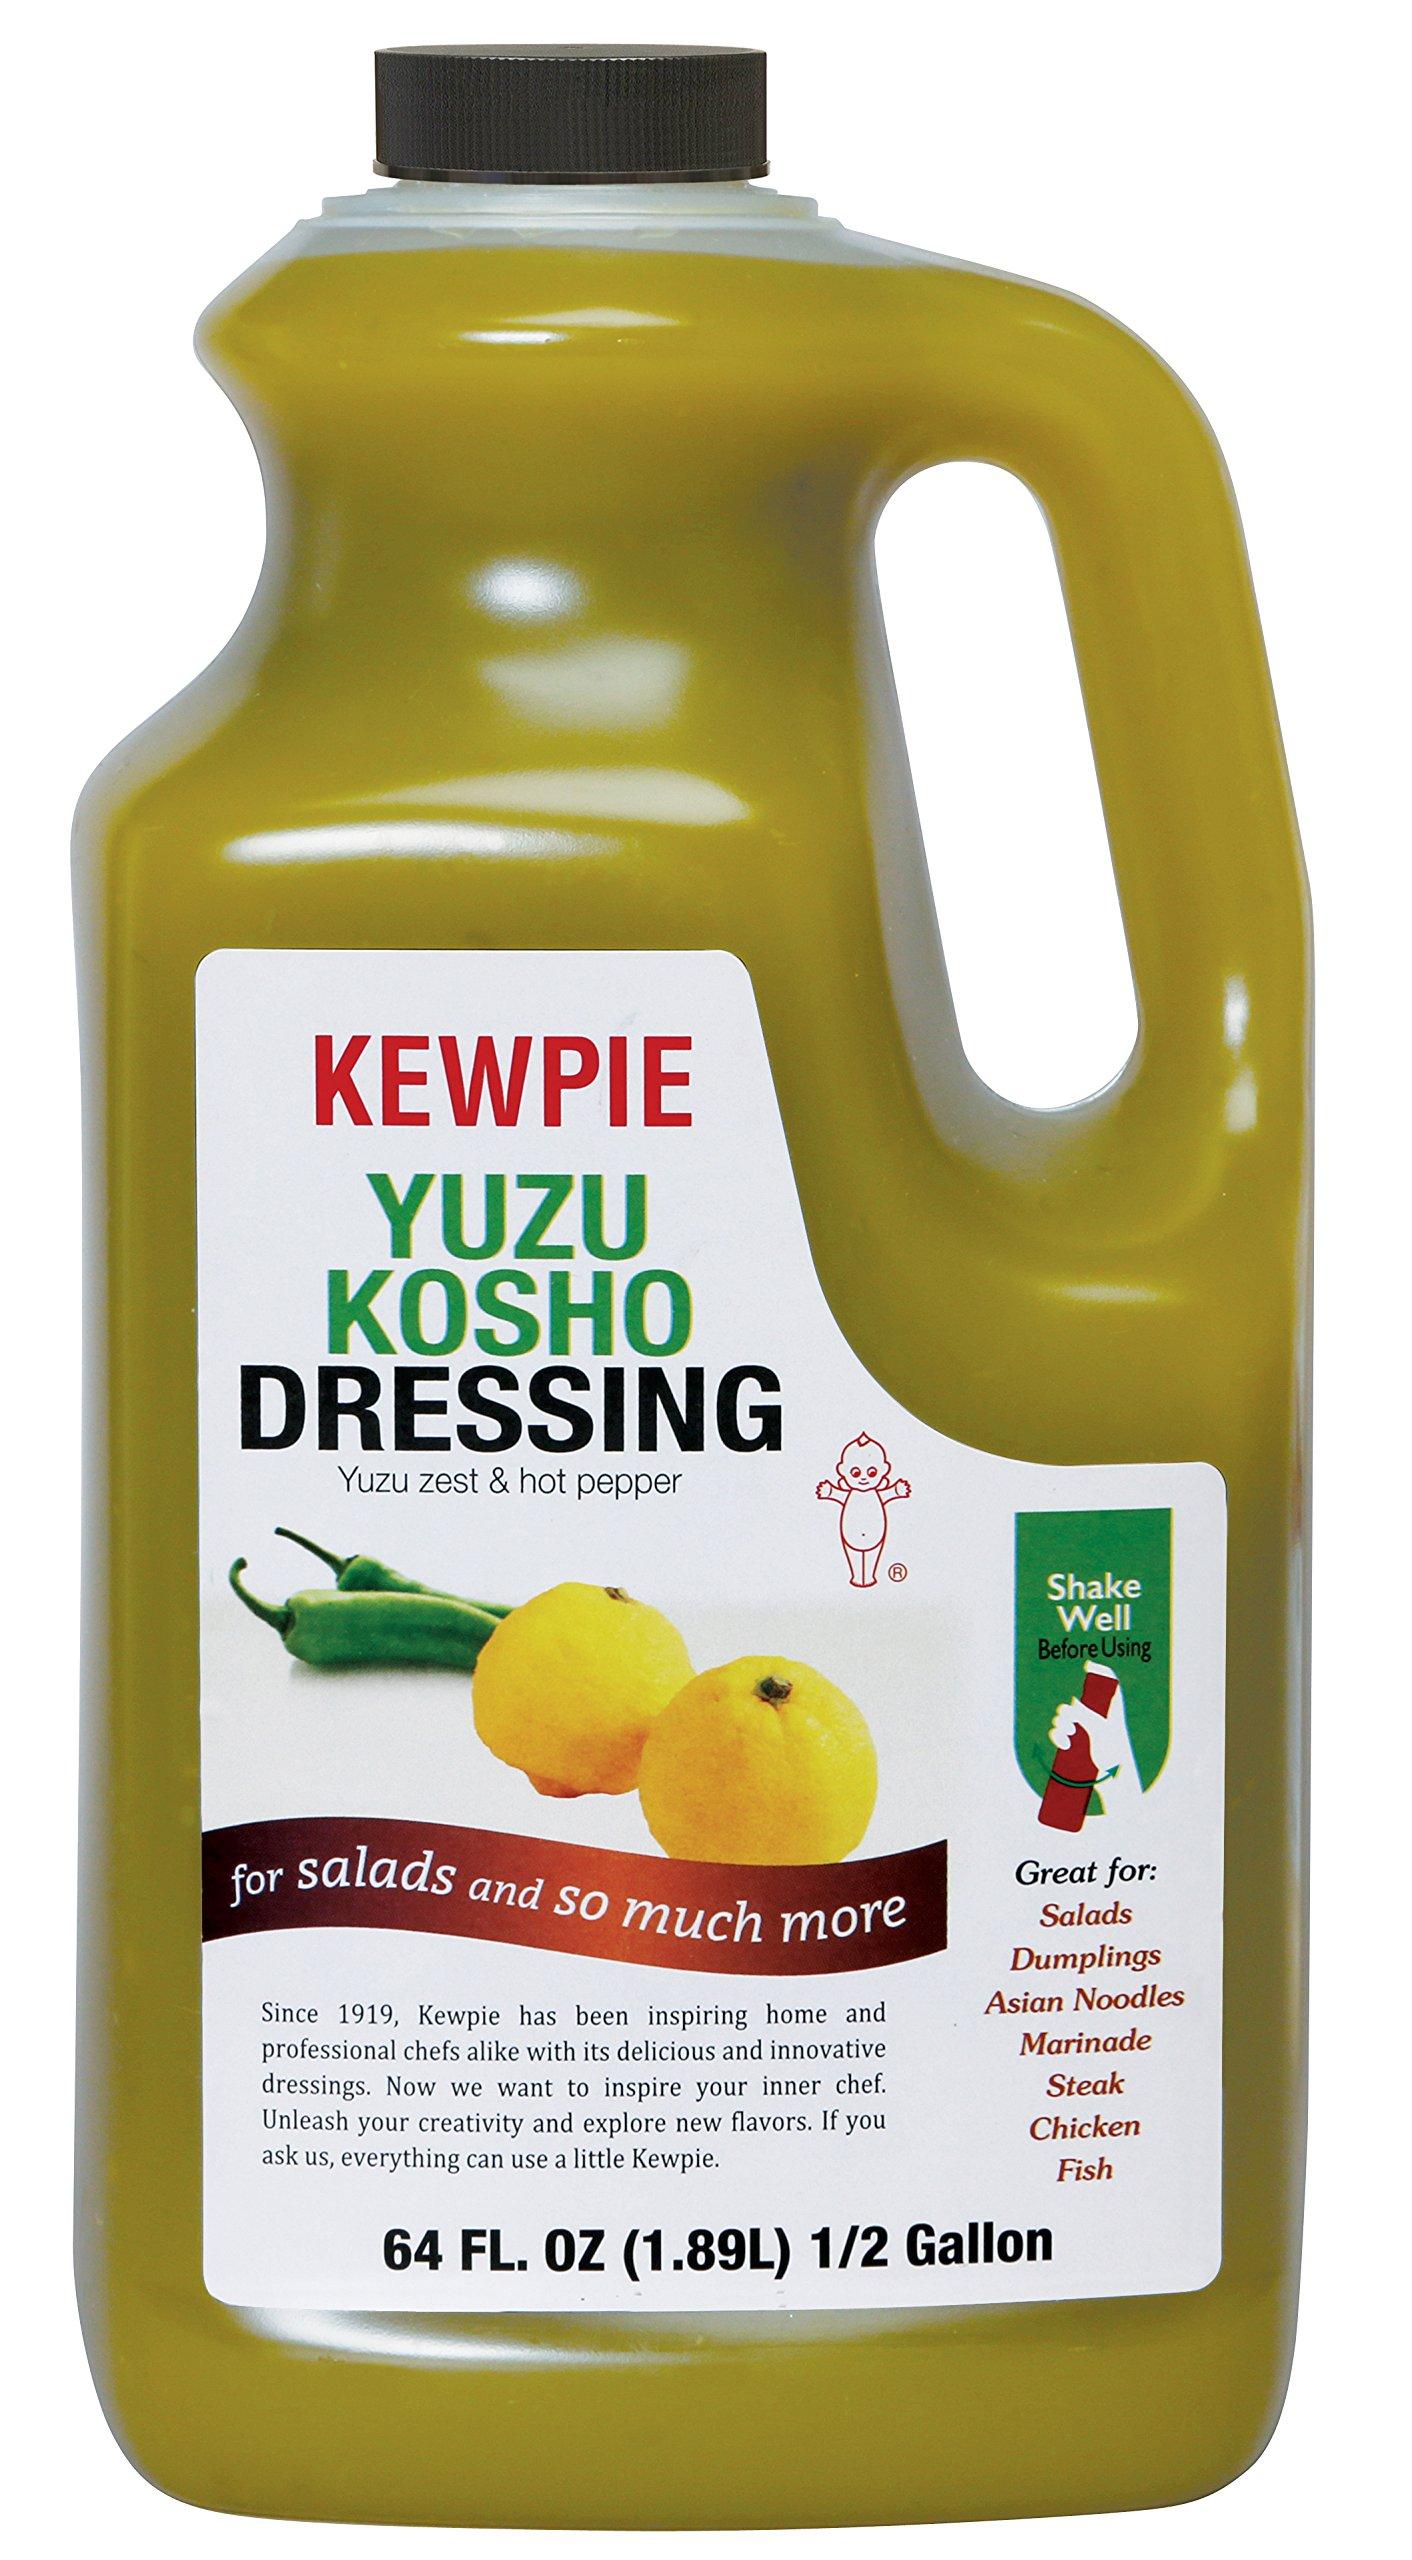 Kewpie Yuzu Kosho Dressing, 64 oz by Kewpie